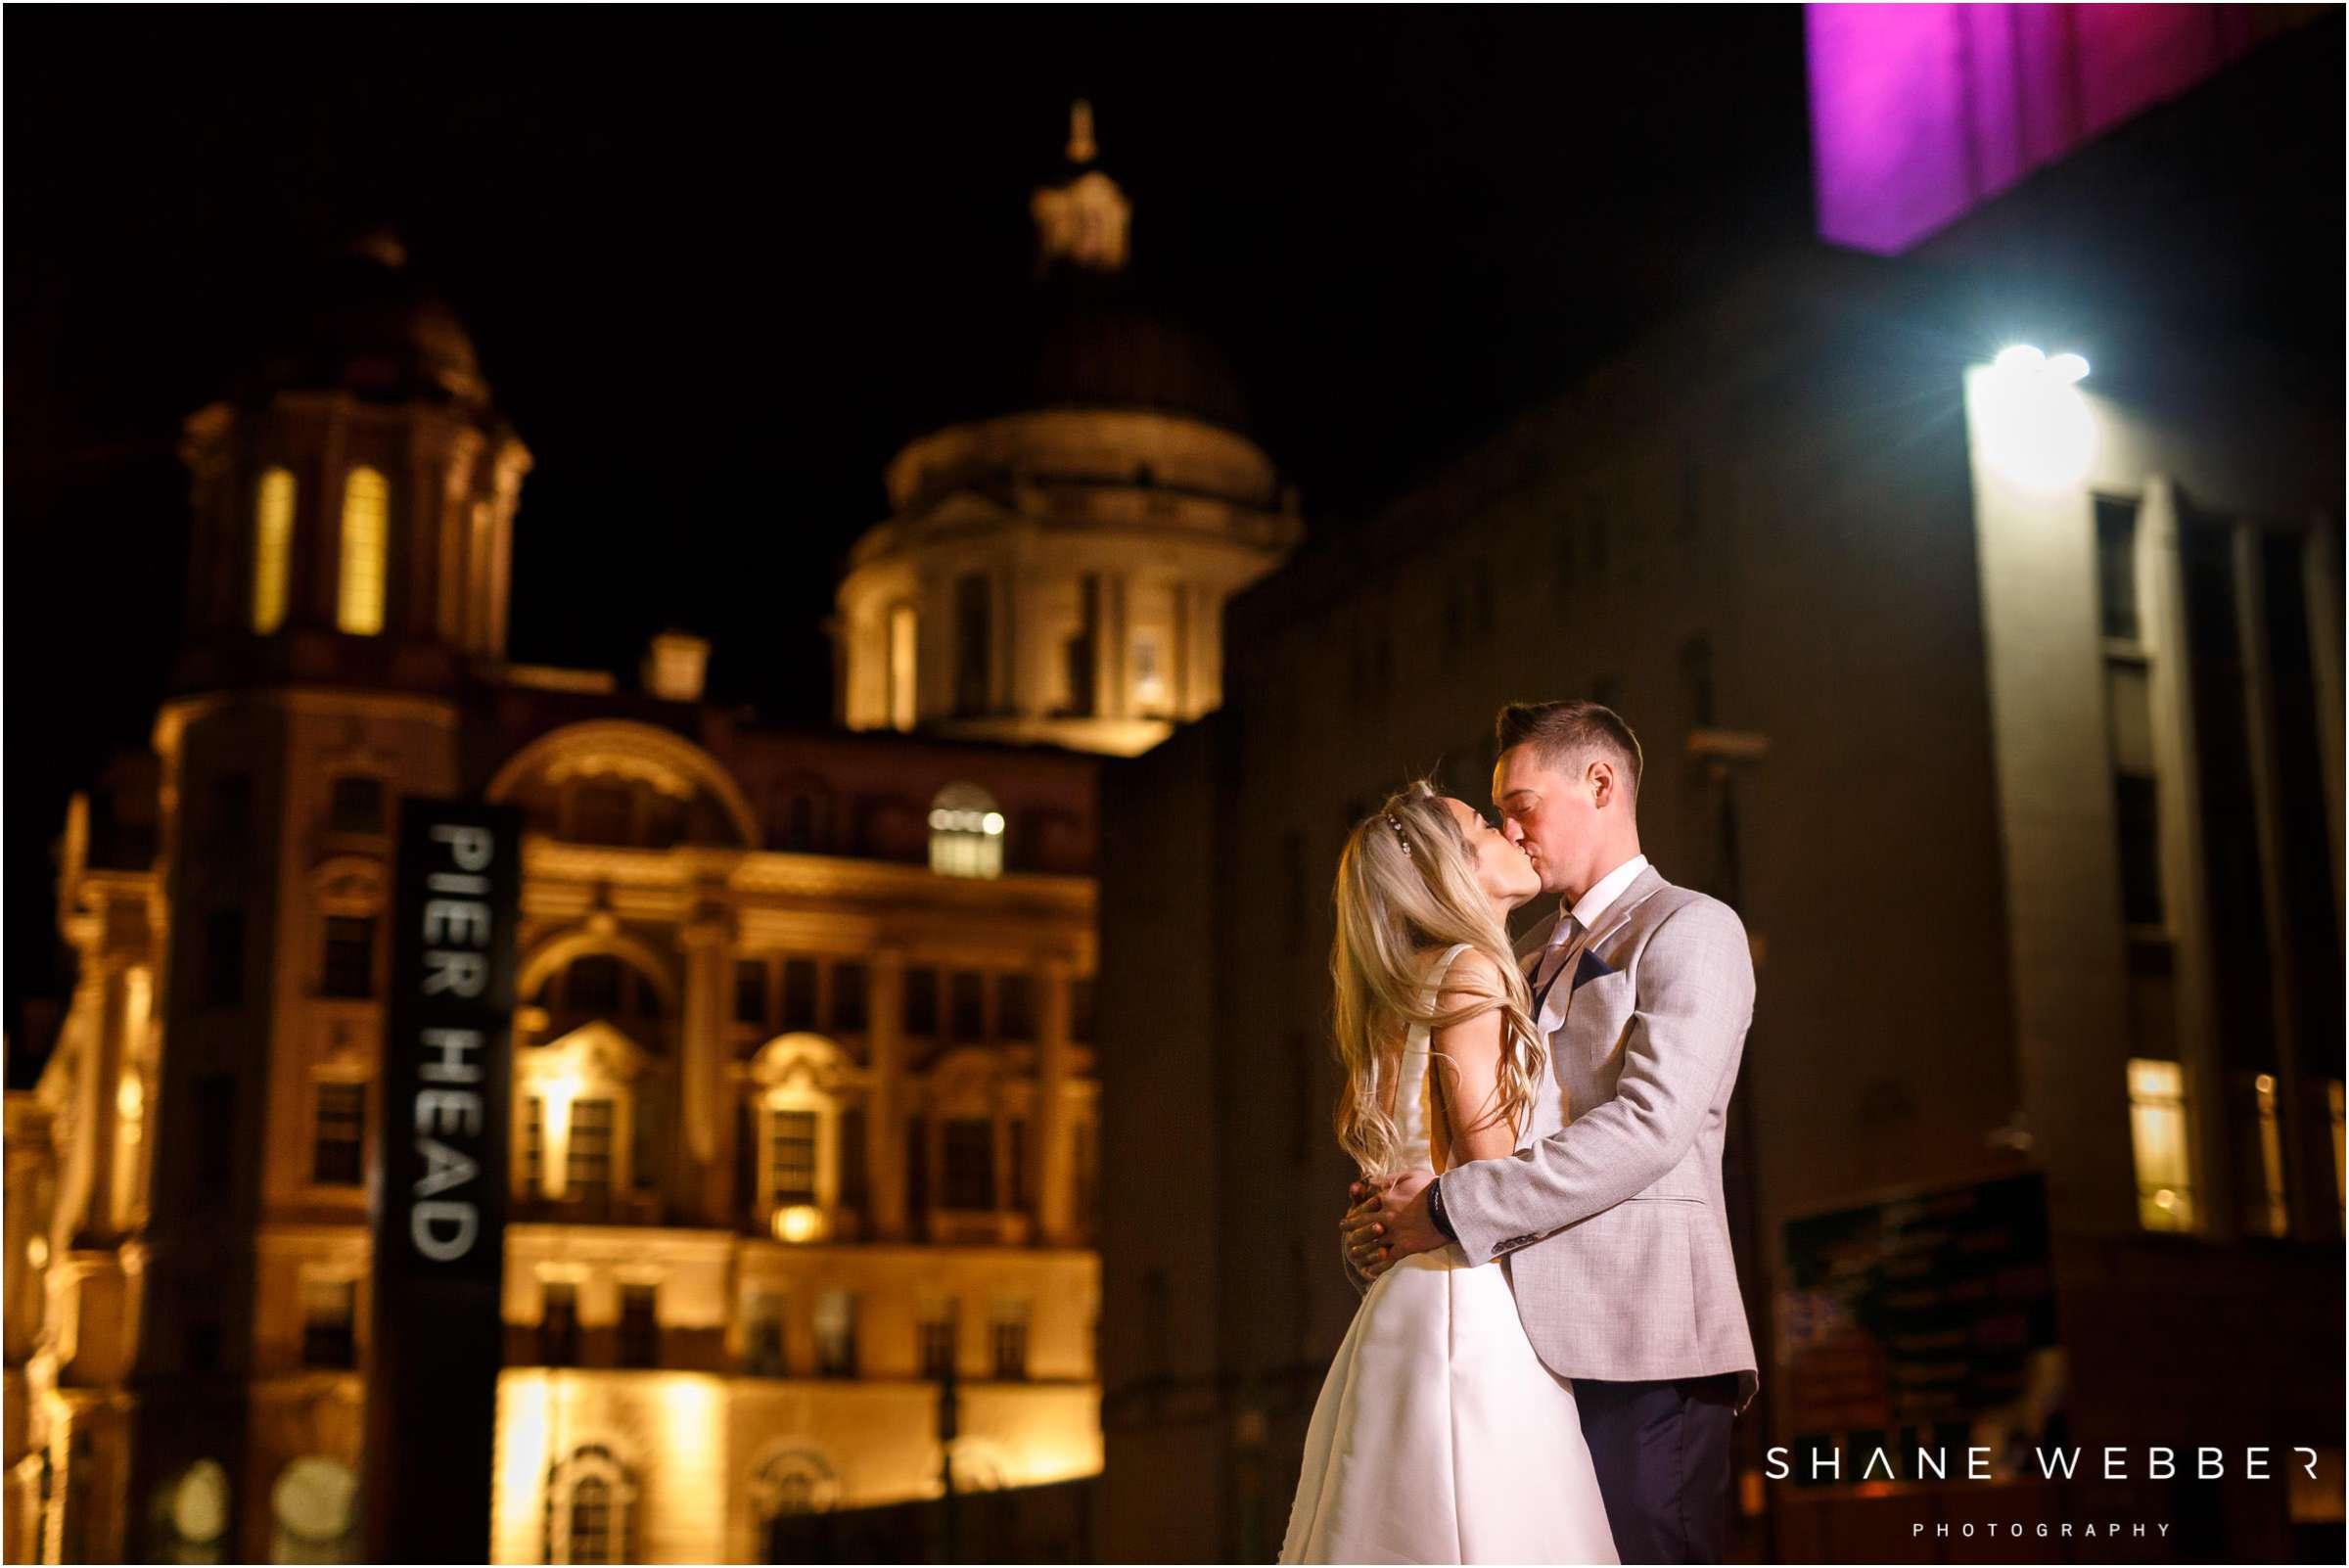 30 James St wedding photography